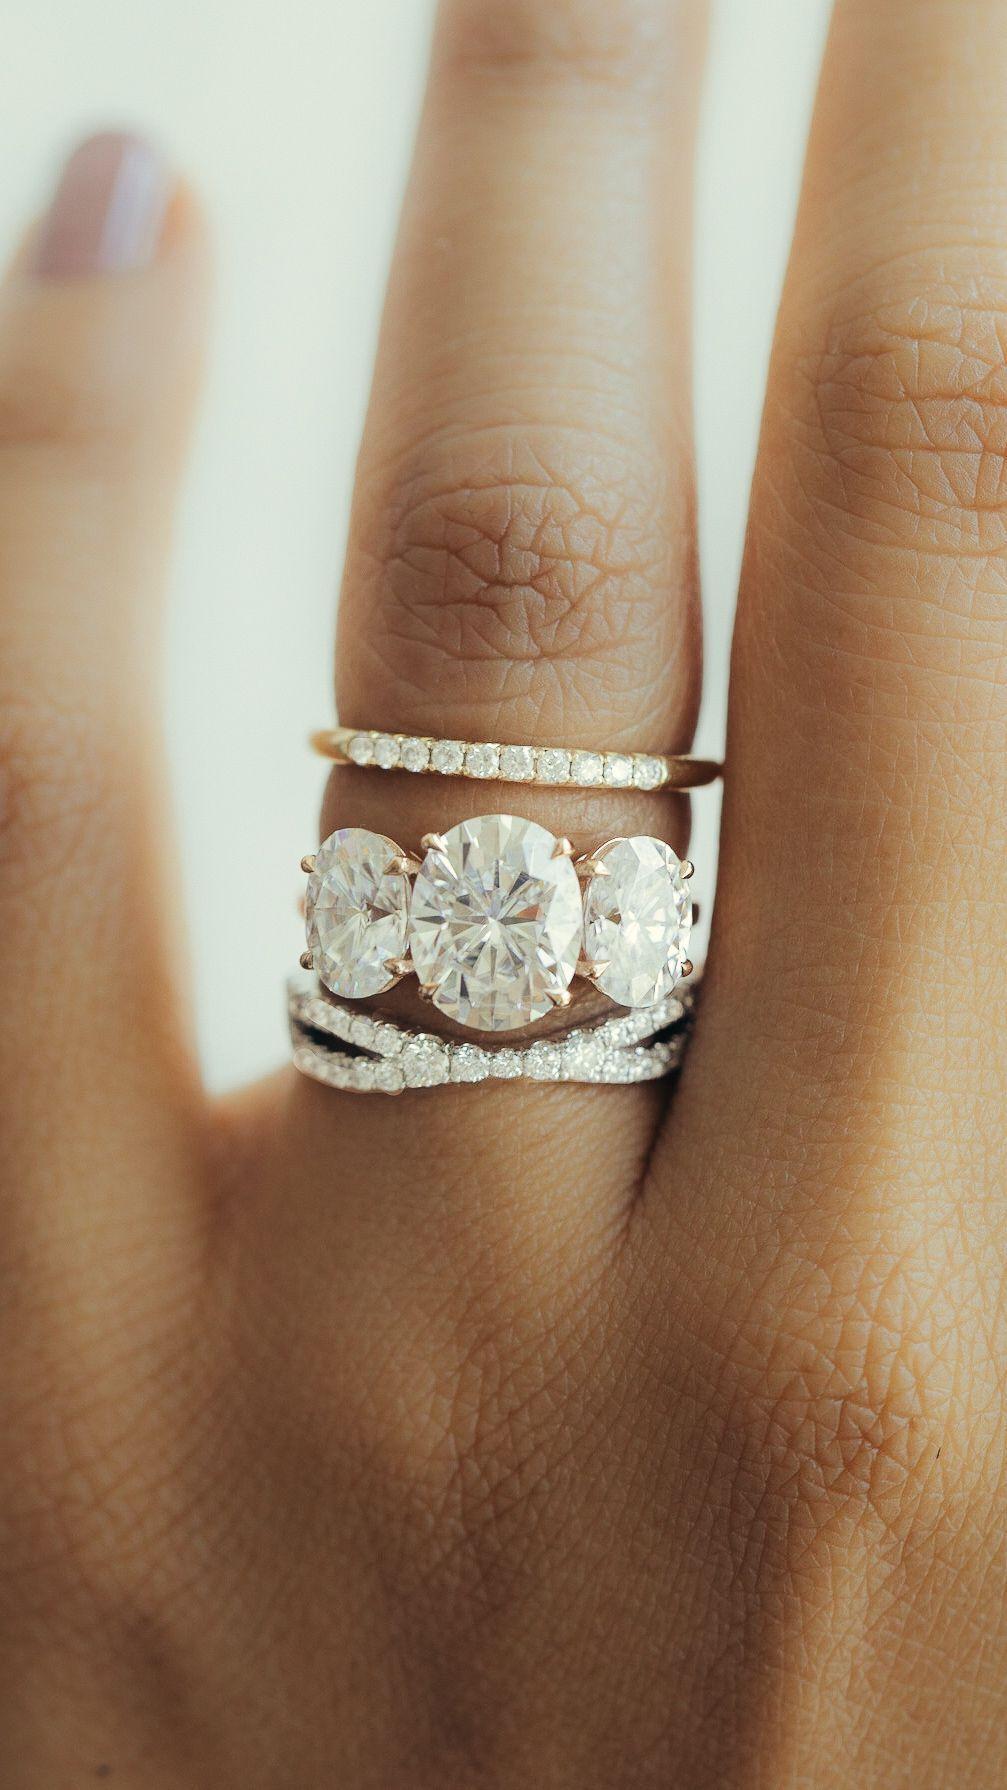 Wedding Venues Tennessee Nashville Bohoweddingcakefondant Bohoweddingalter Weddingce In 2020 Wedding Rings Teardrop Wedding Rings Unique Wedding Rings Vintage